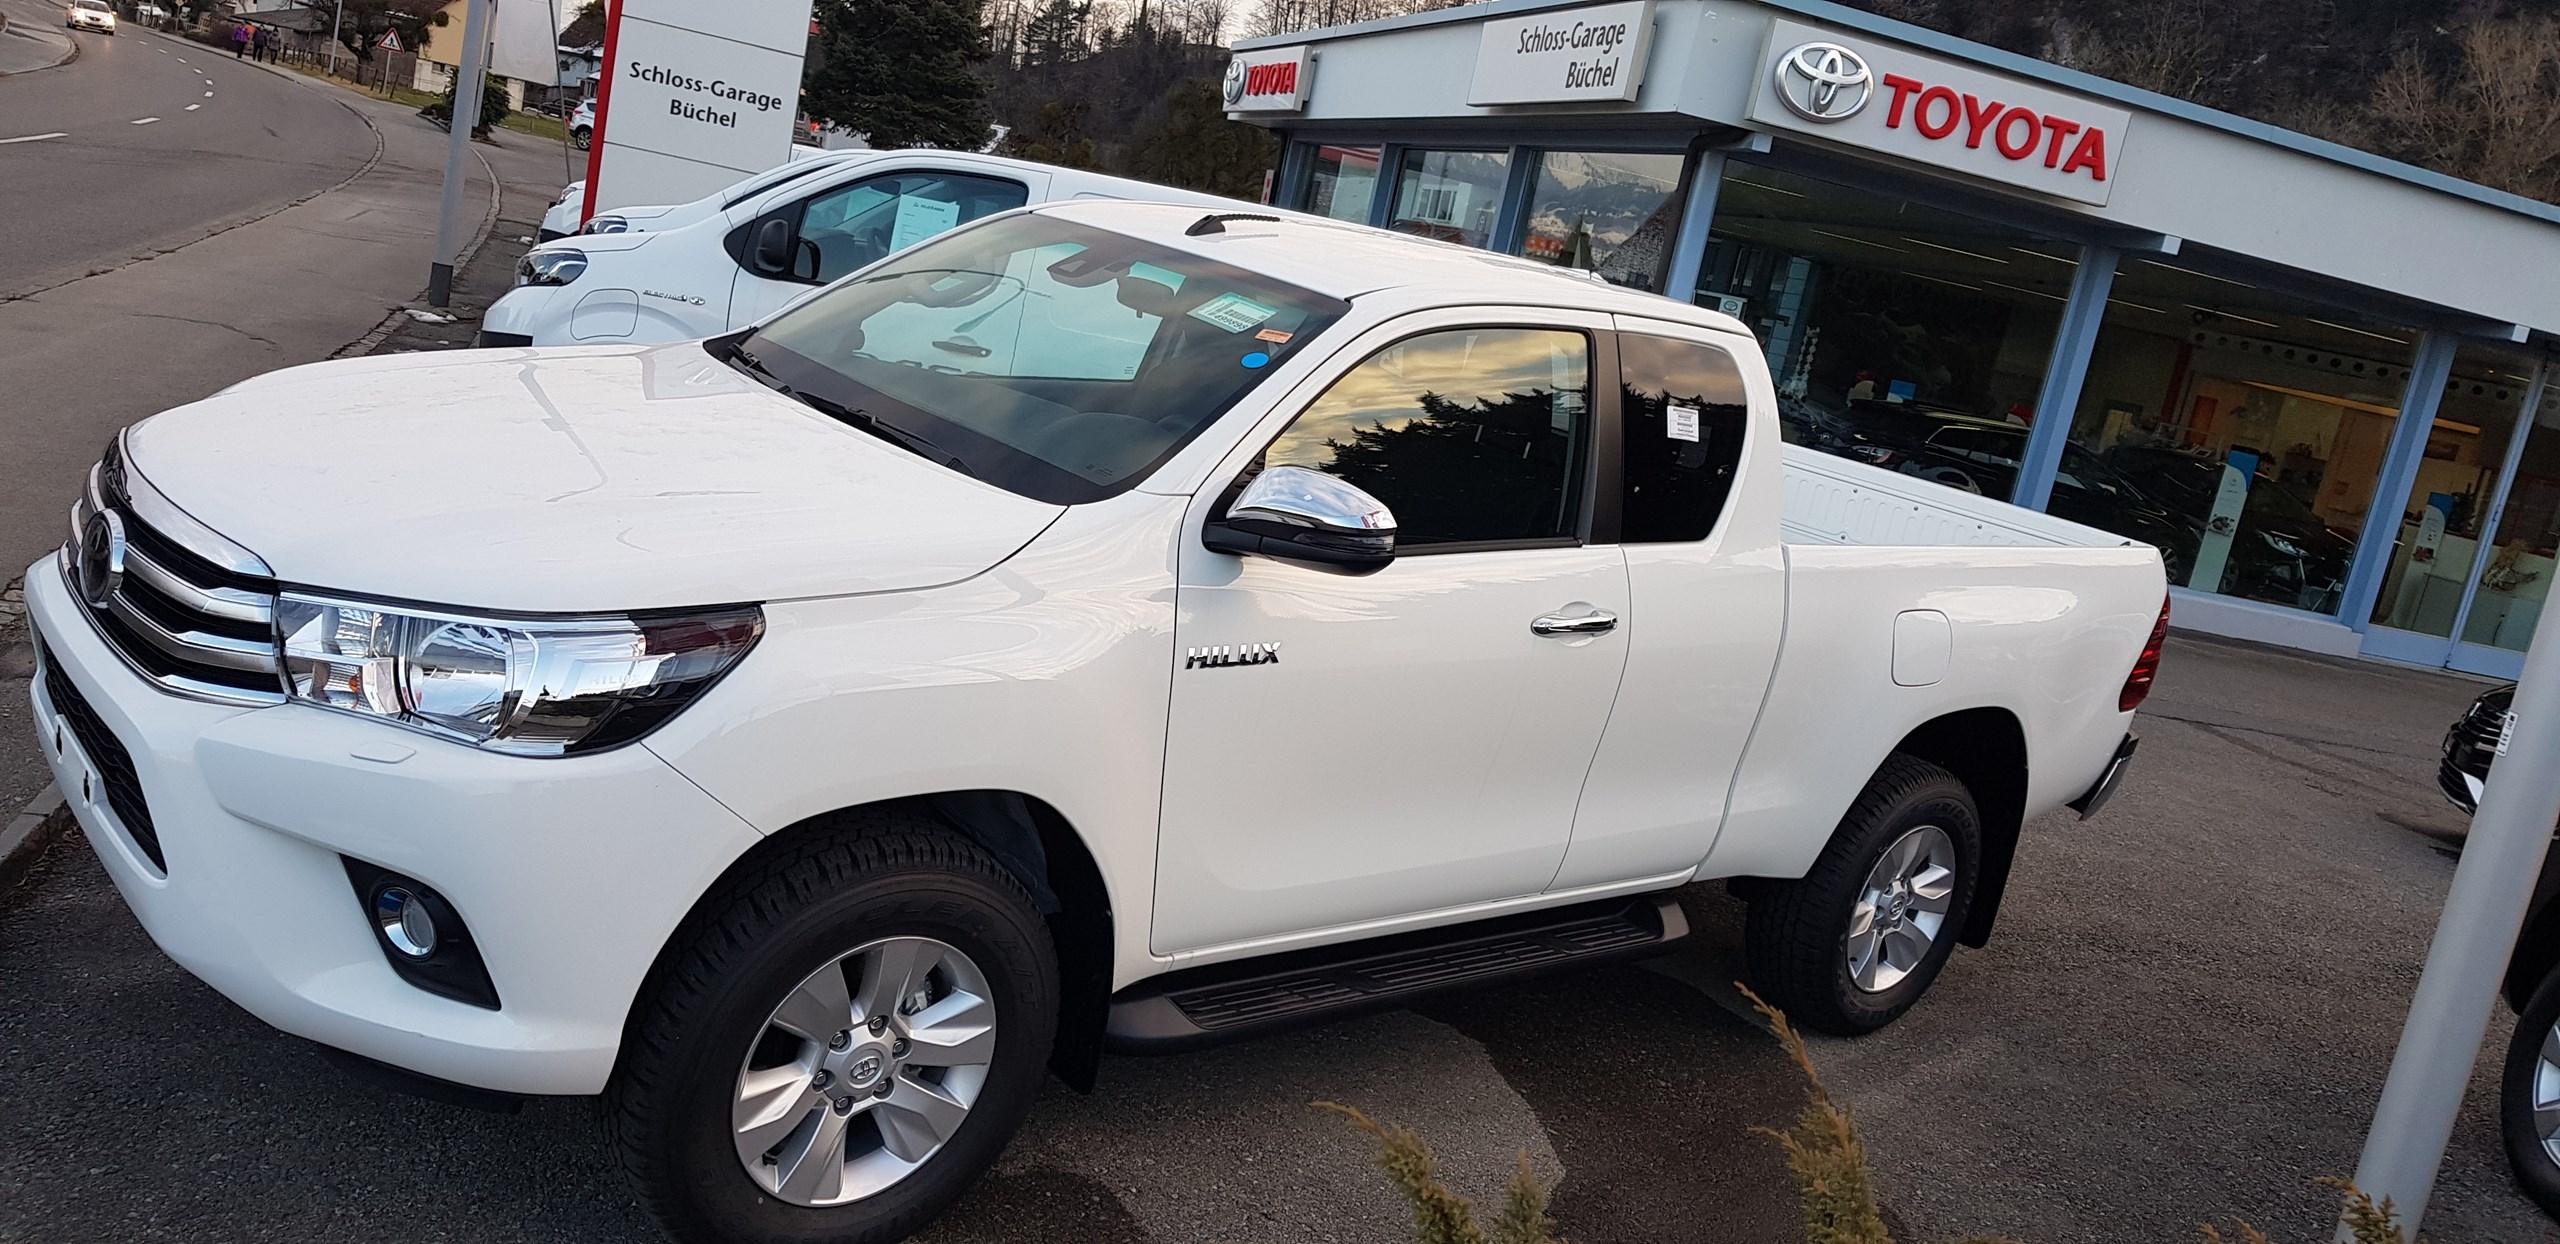 suv Toyota Hilux HI-LUX Extra Cab